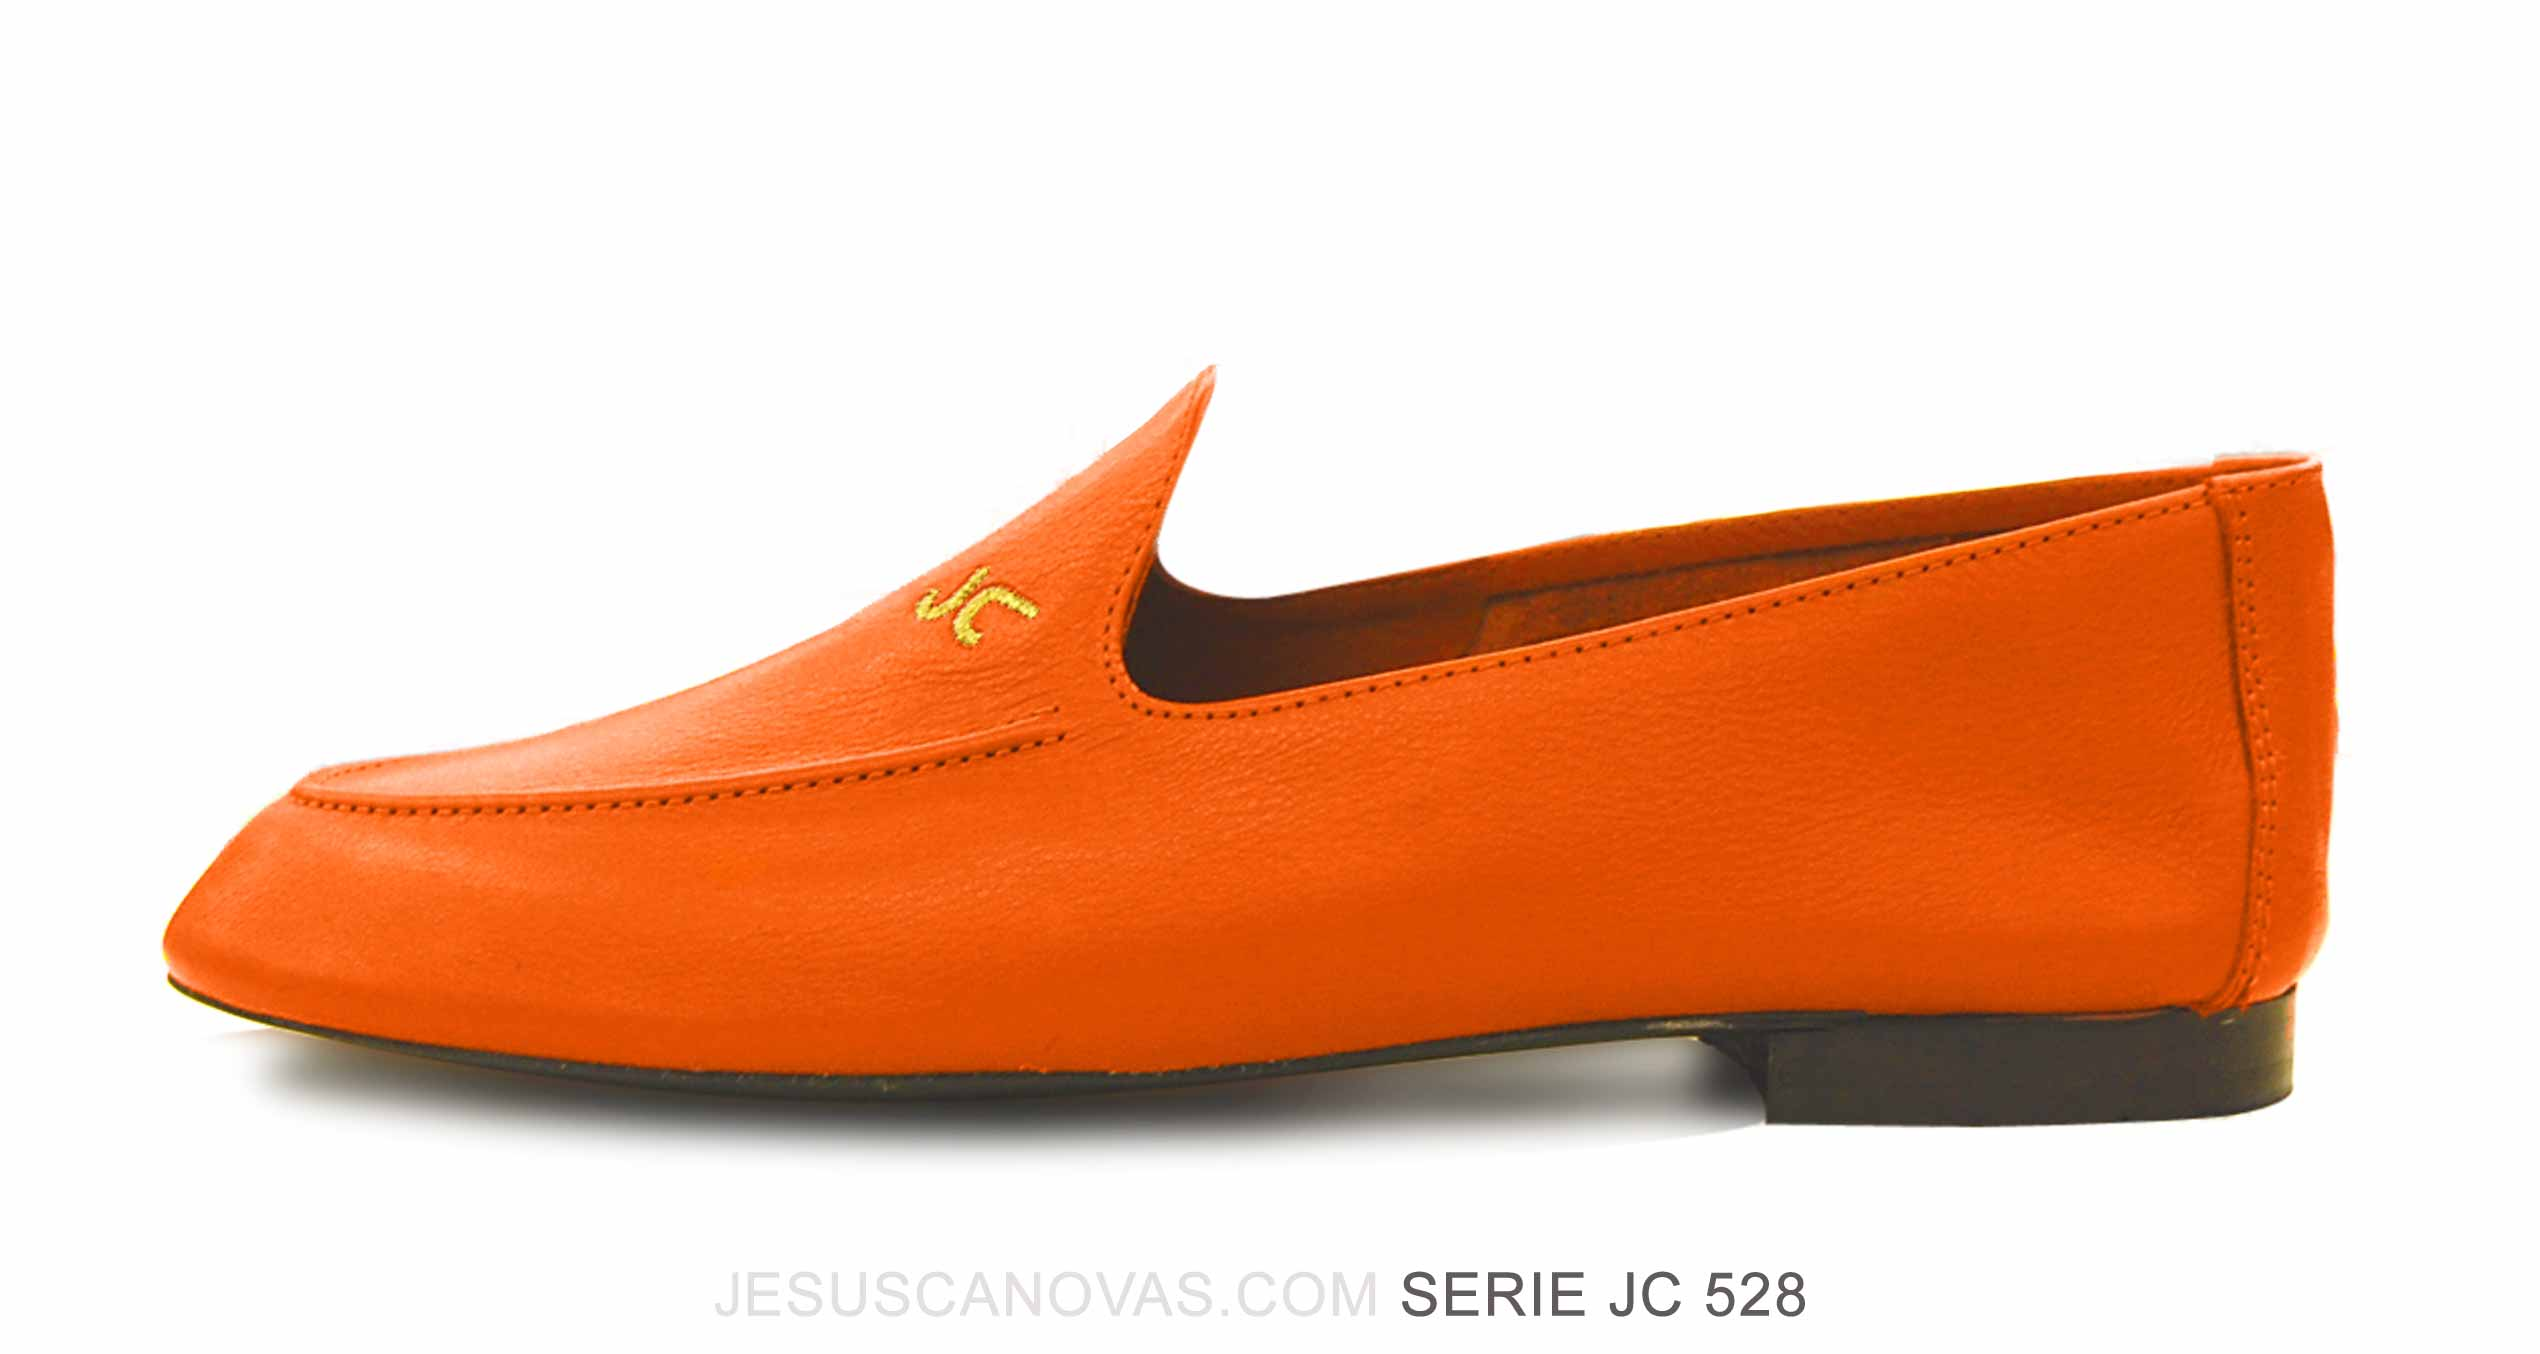 Foto 1 de Zapatos Julio Iglesias Mocasin 528 JC Naranja Napa